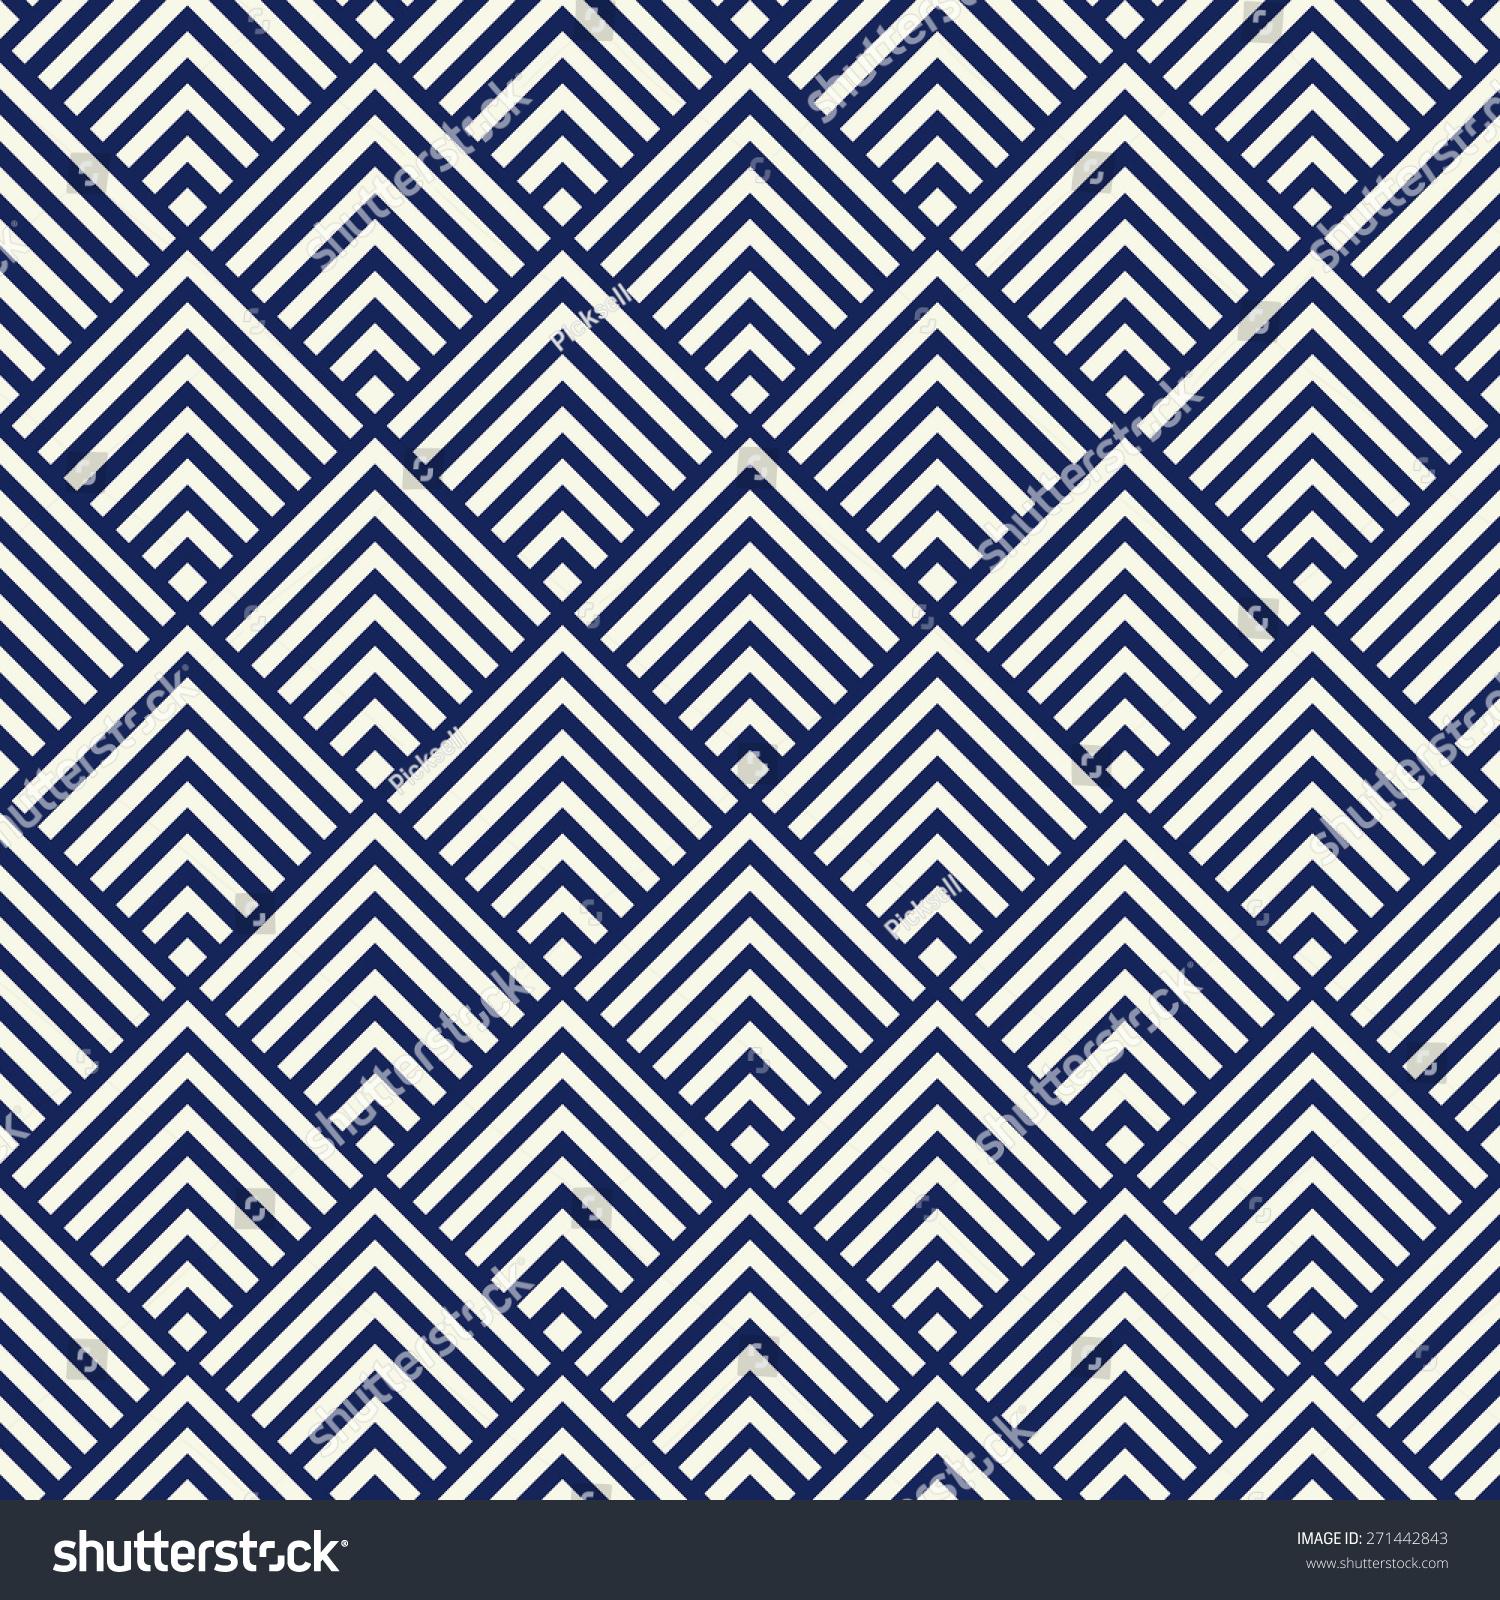 seamless porcelain indigo blue white art stock illustration 271442843 shutterstock. Black Bedroom Furniture Sets. Home Design Ideas